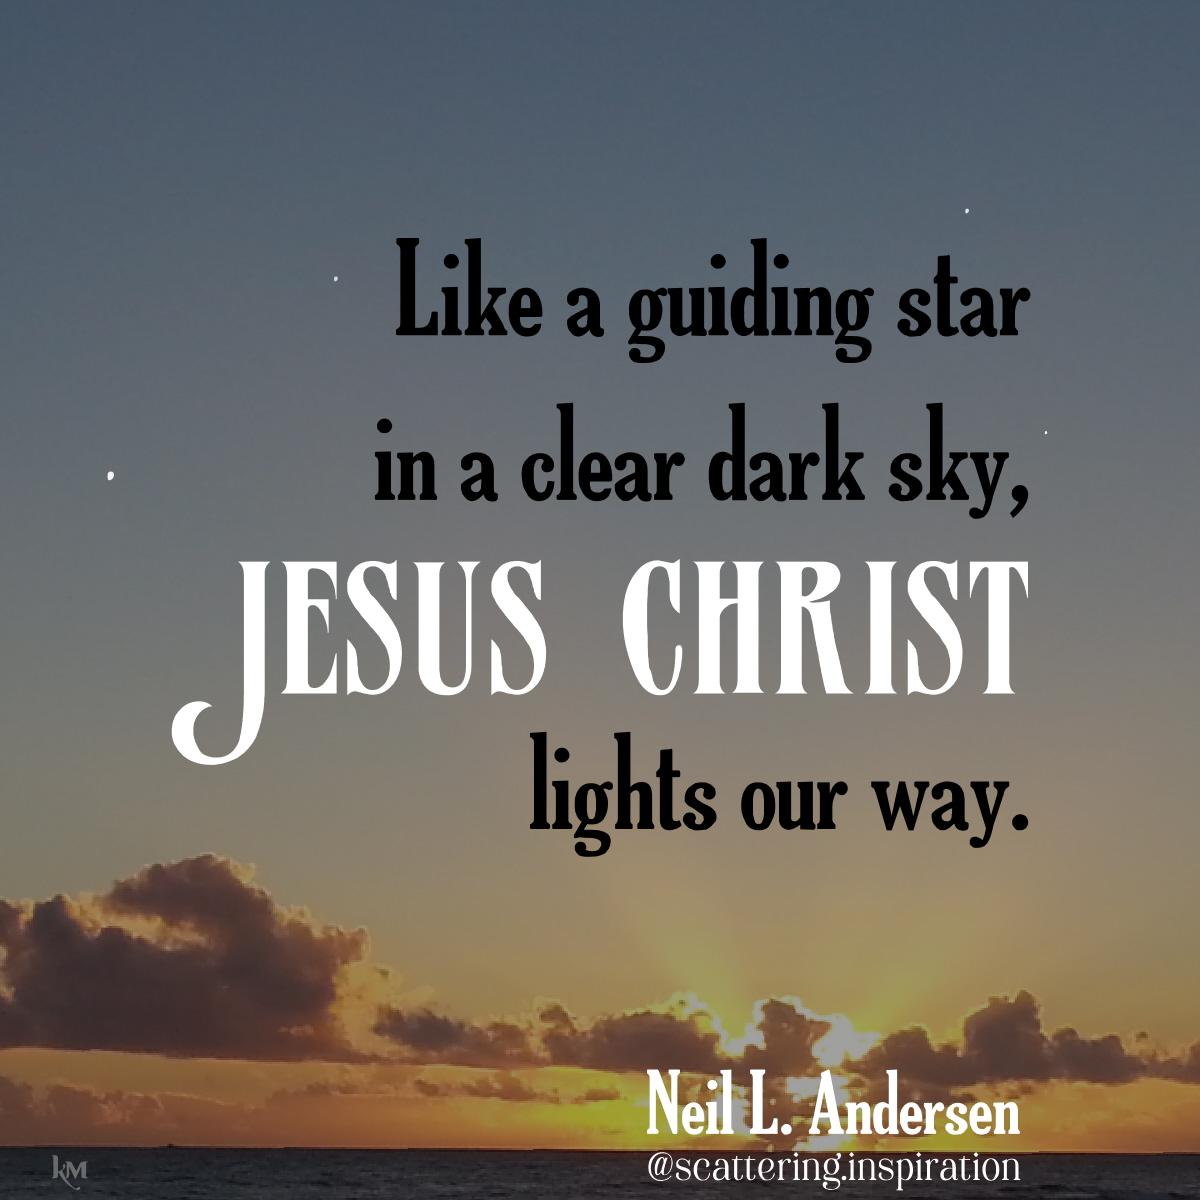 Jesus Christ lights the way